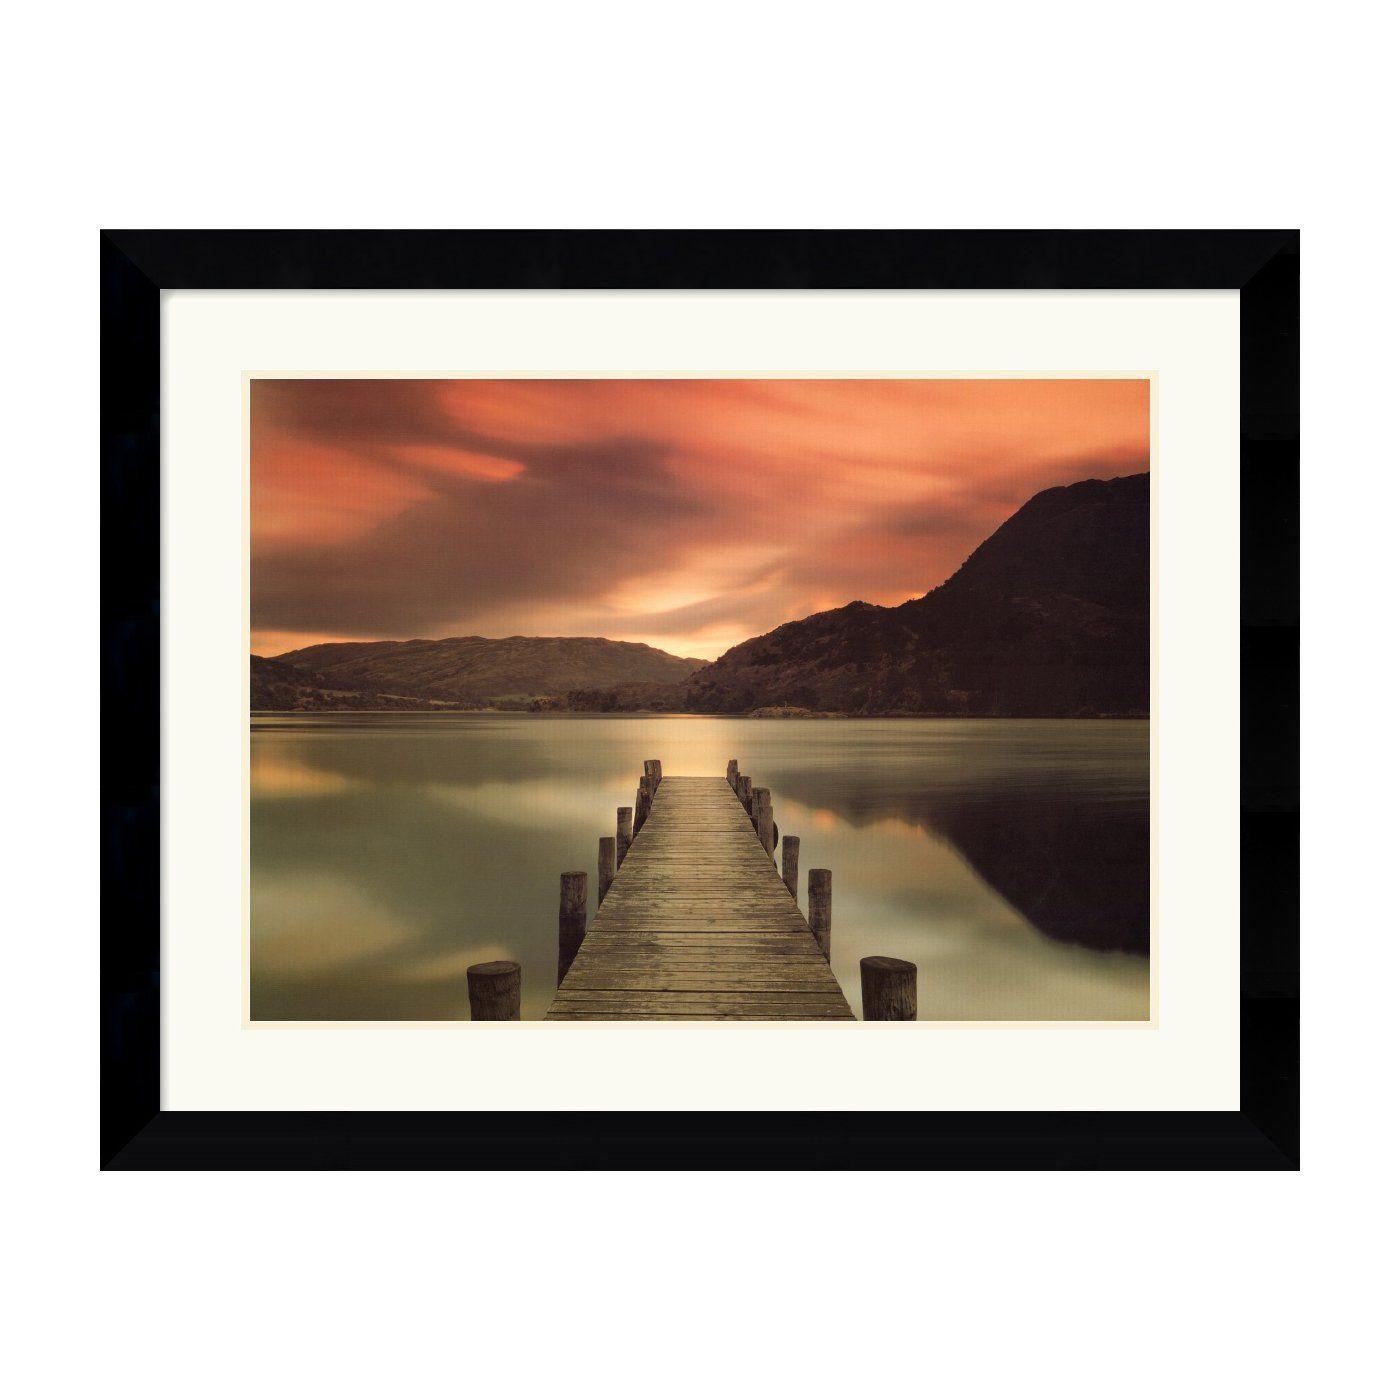 Mel Allen Ullswater Glenridding Cumbria I Got This Print At Ikea Years Ago Beautiful Framed Art Prints Framed Art Lake District